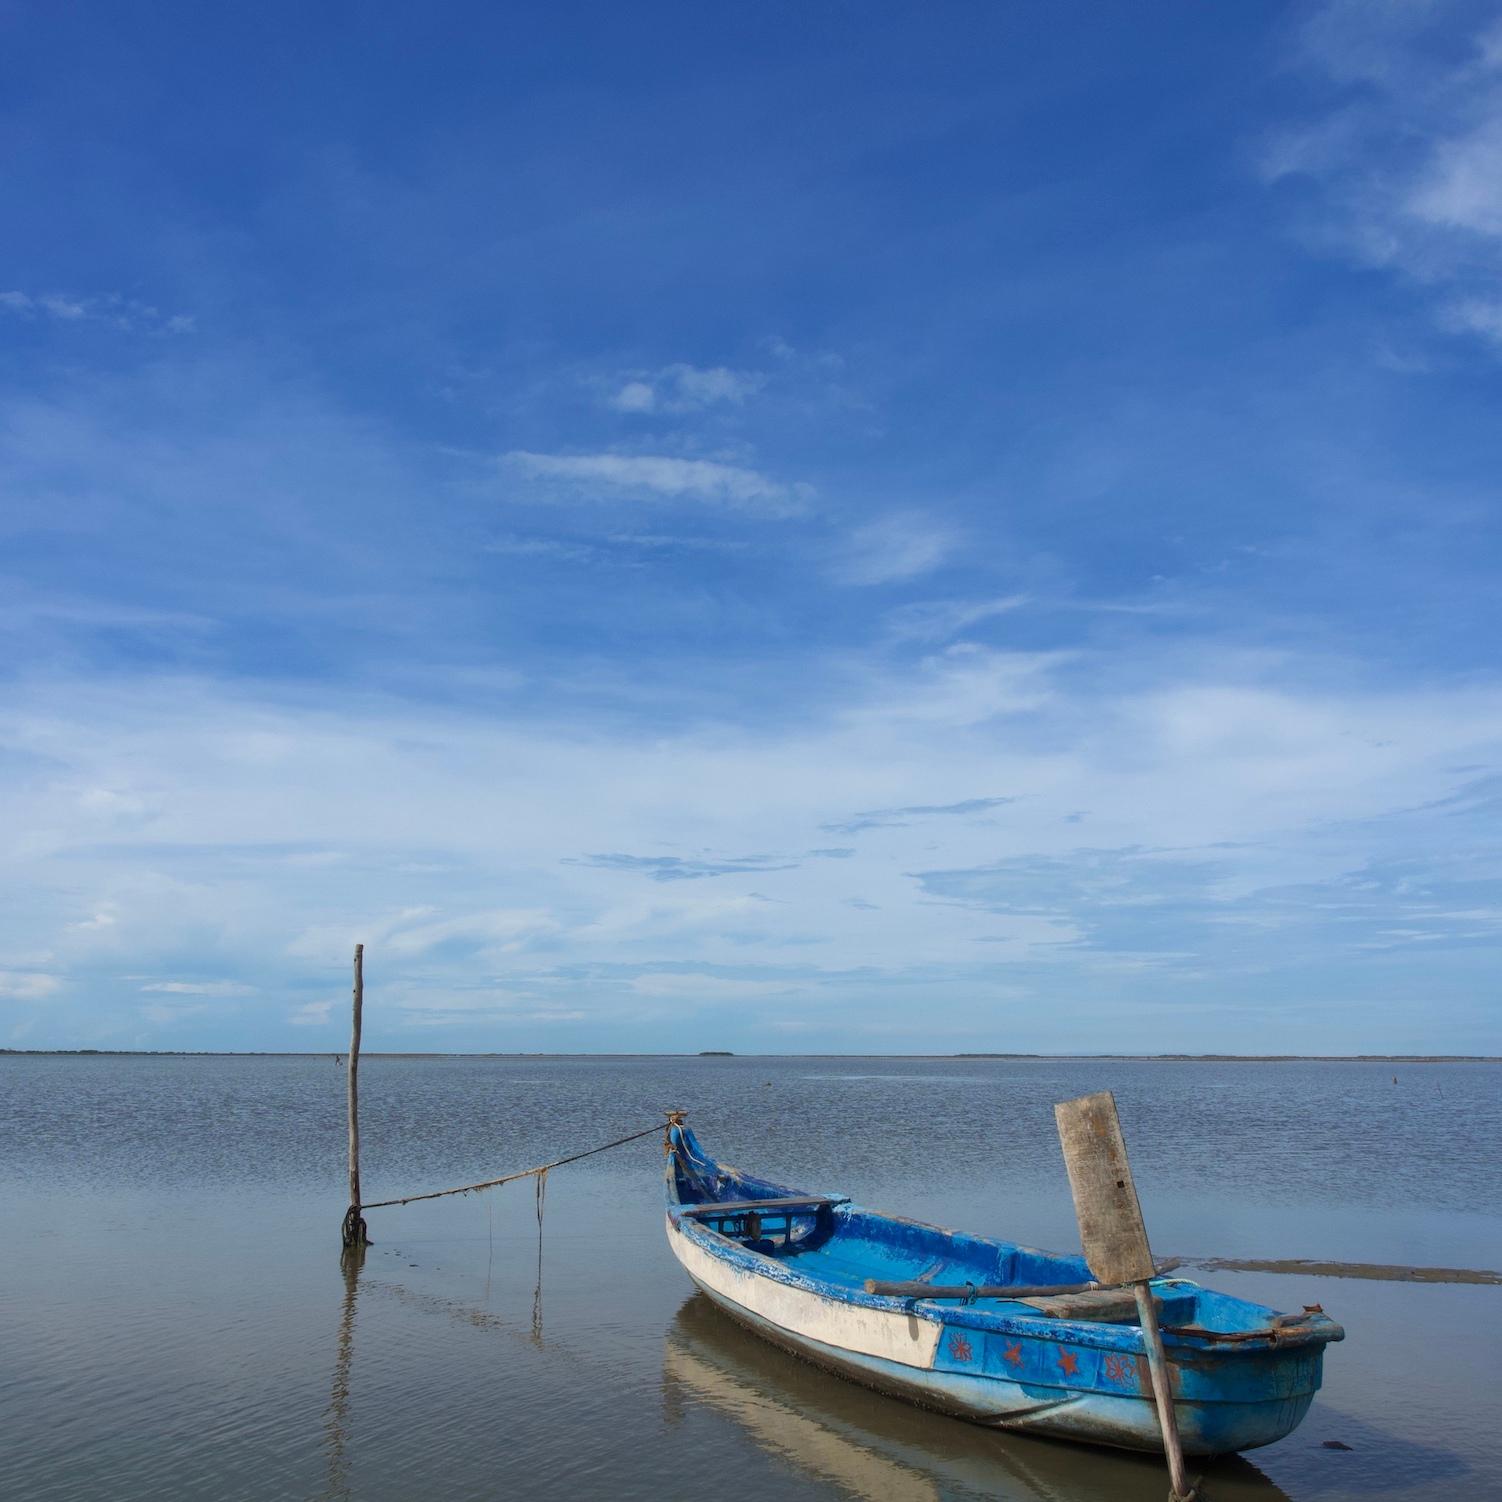 Fishing boat facing the Indian Ocean.